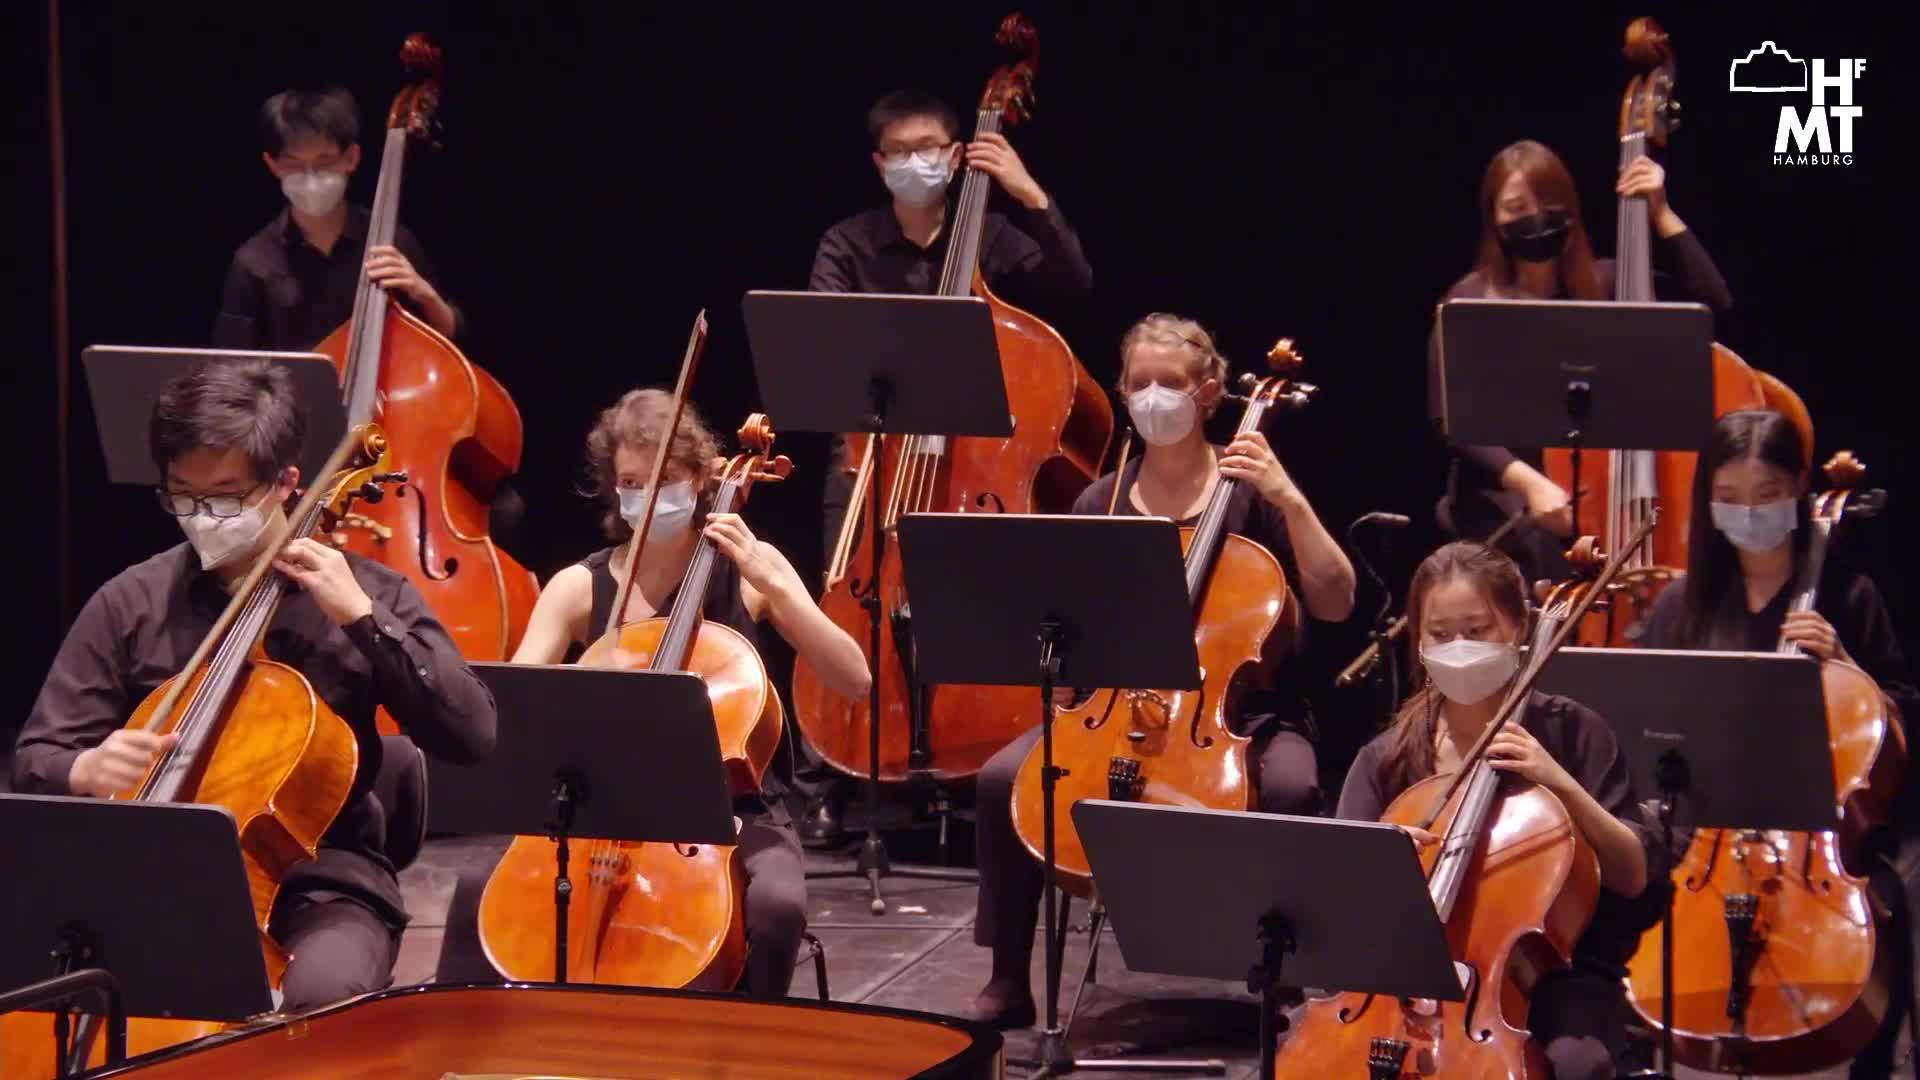 Thumbnail - SYMPHONIEKONZERT mit dem Symphonieorchester der HfMT